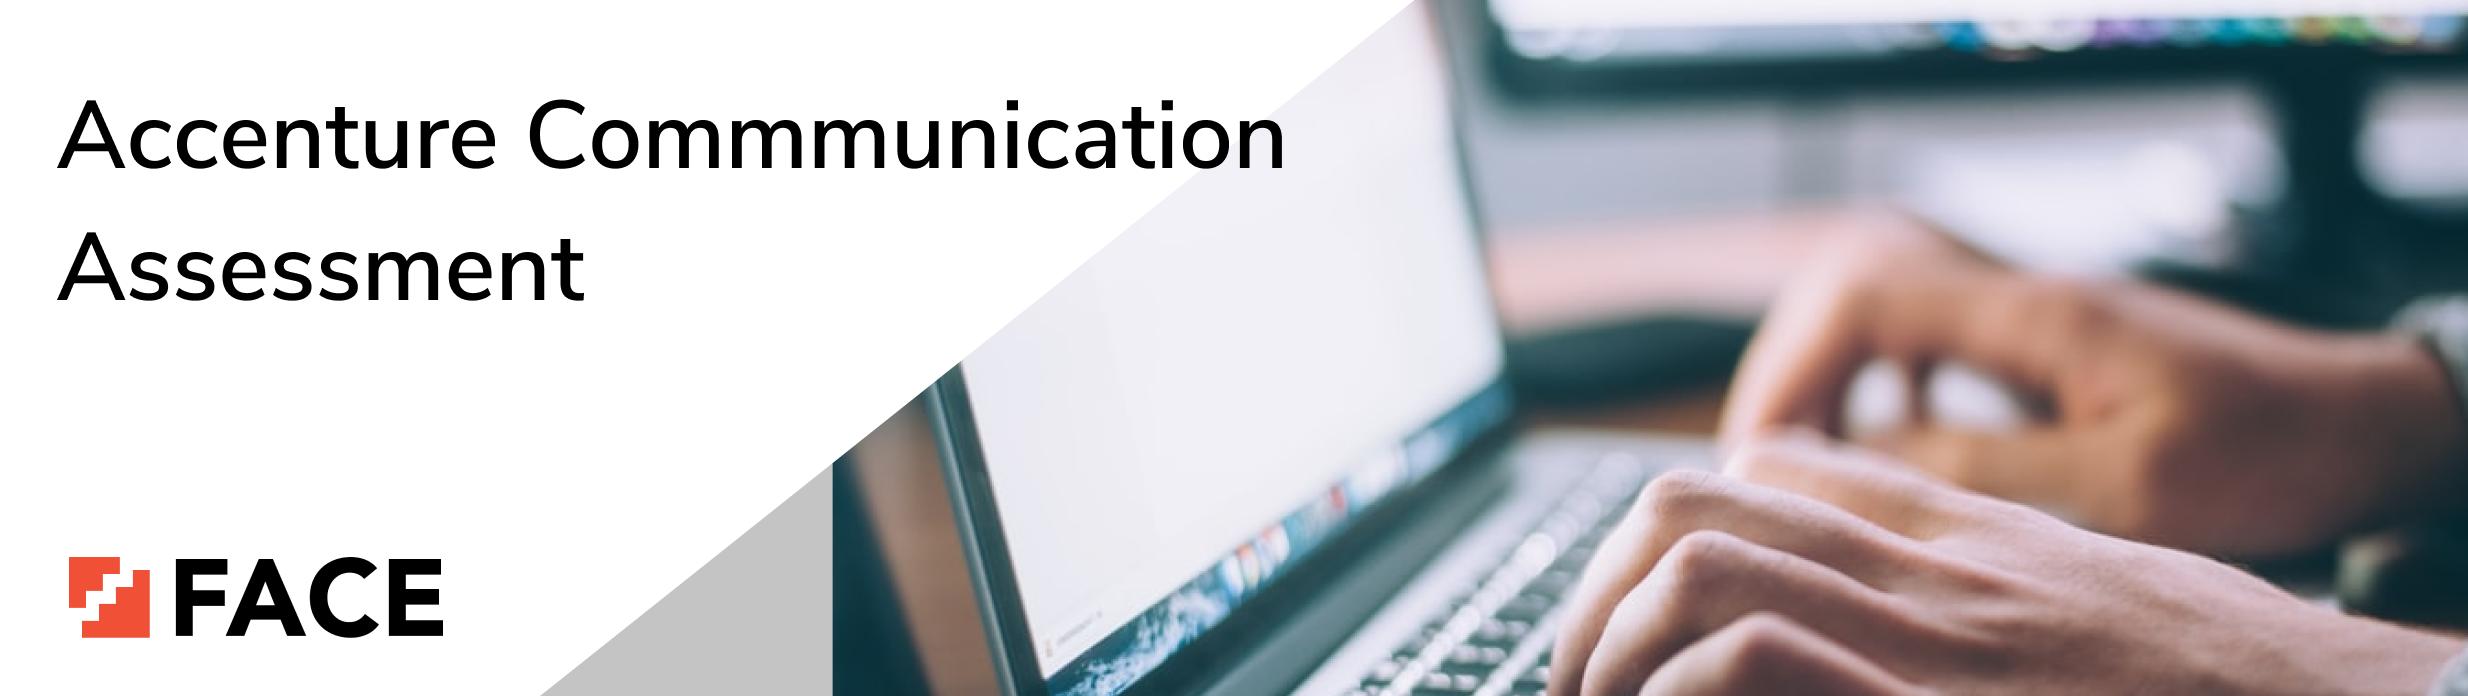 accenture communication assessment